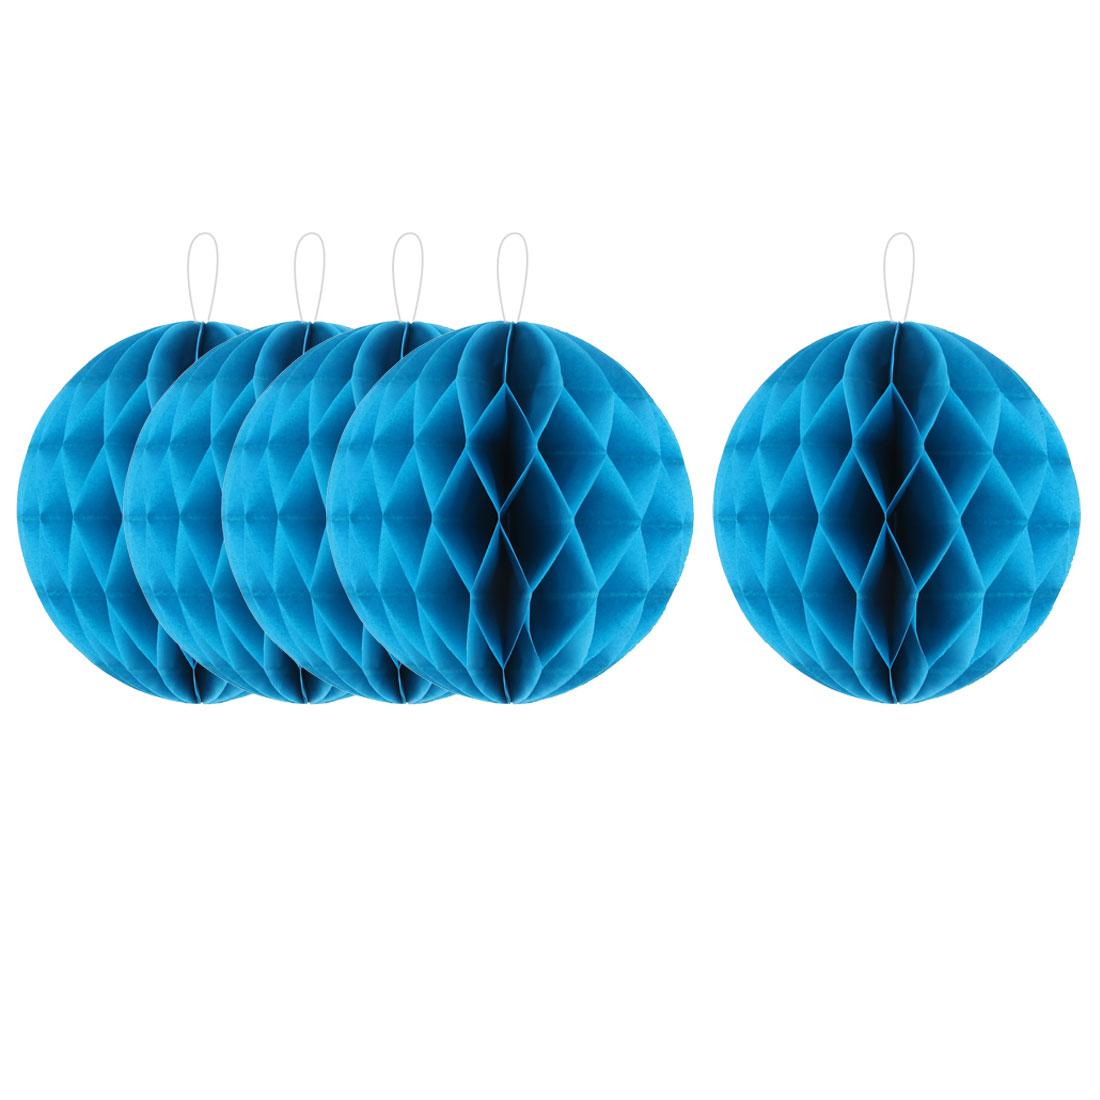 Party Lantern Design Tree Hanging DIY Decor Honeycomb Ball Sky Blue 6 Inch Dia 5pcs